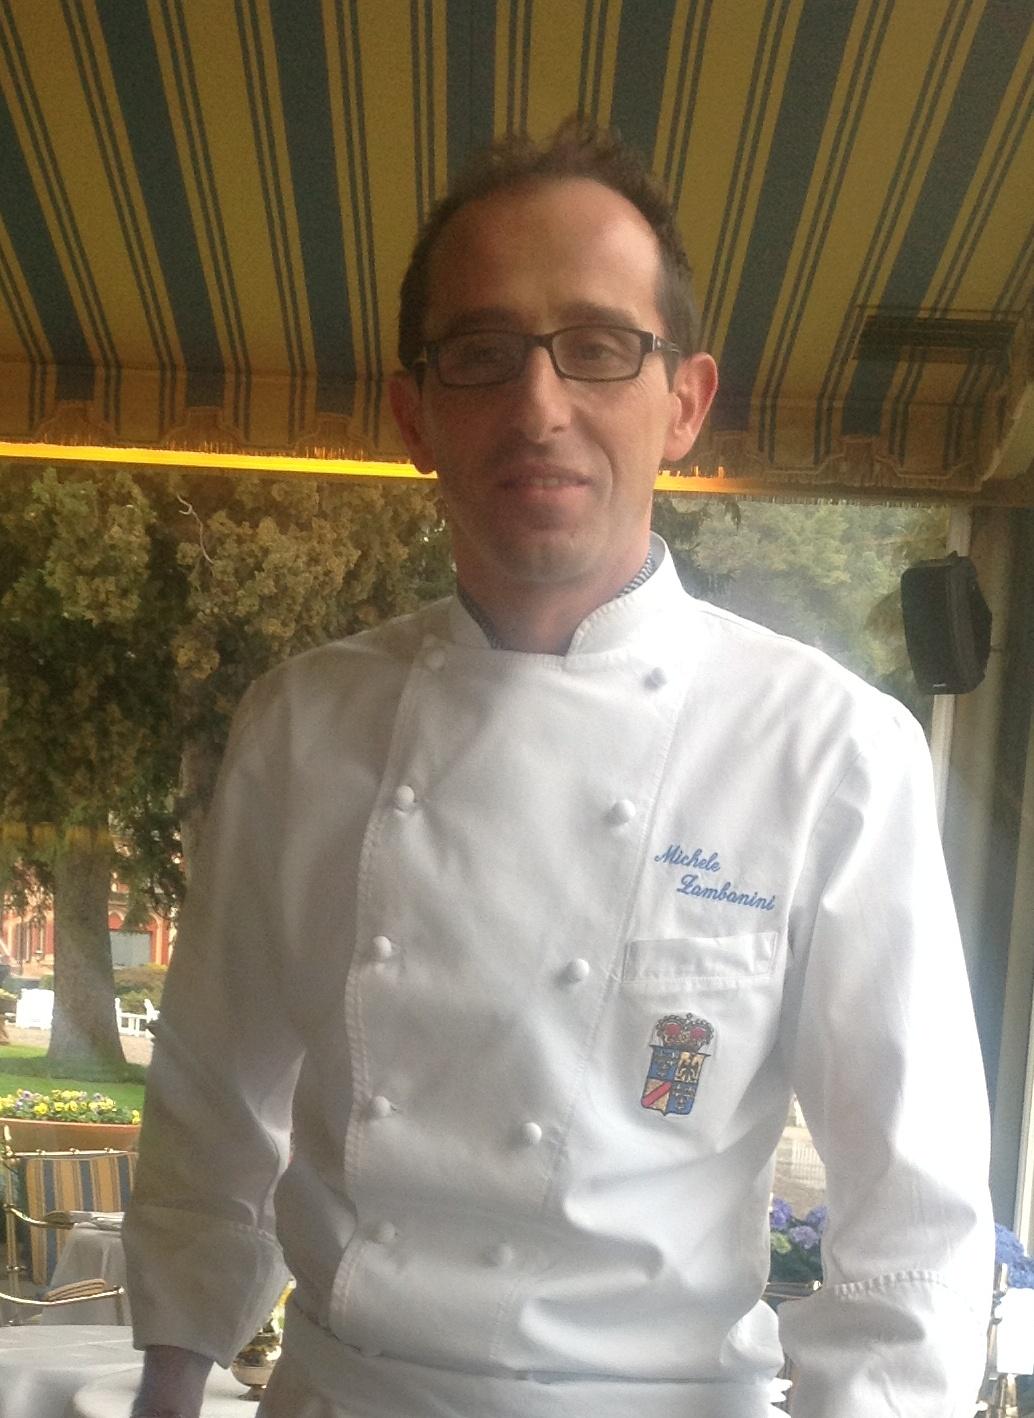 Un giorno nella cucina di villa d 39 este a cernobbio - Cucina villa d este ...